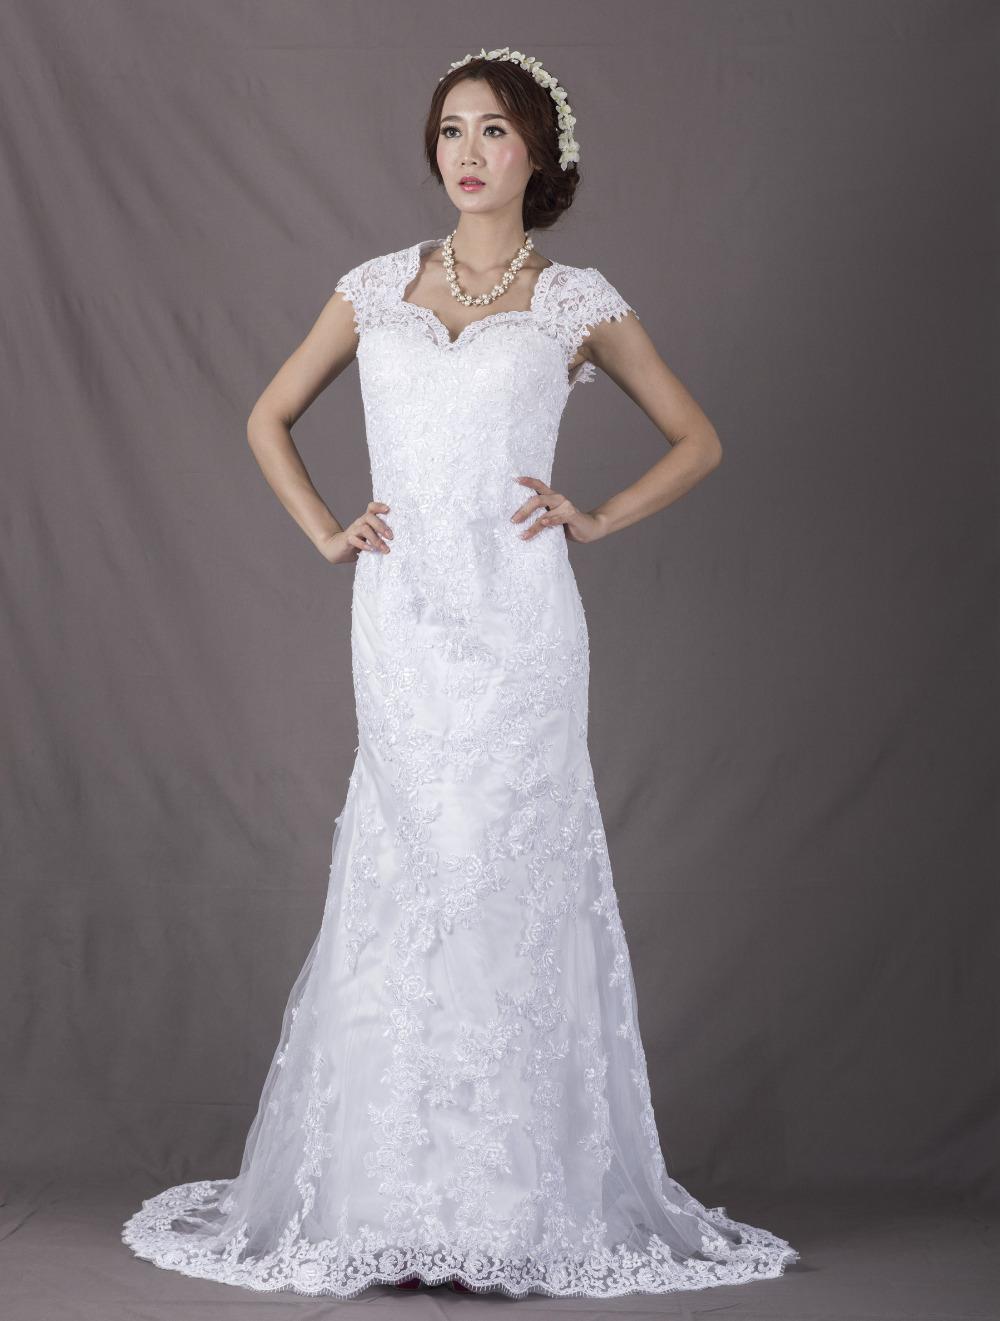 High quality promotion elegant women wedding gowns court for Slim white wedding dresses